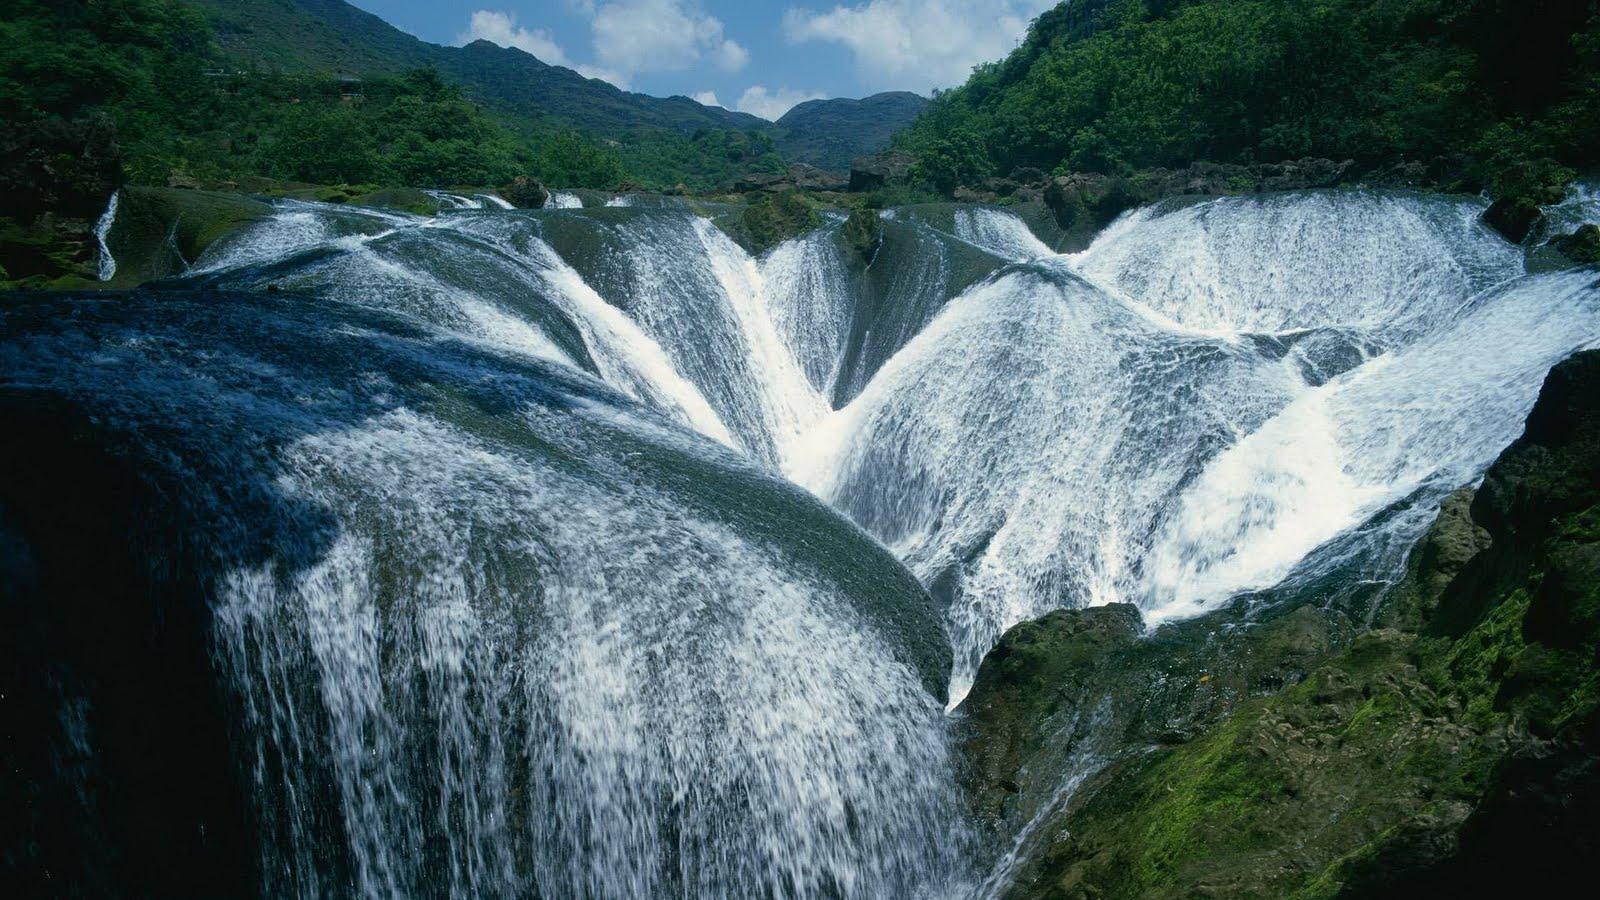 http://2.bp.blogspot.com/-mRMYlZOB8MI/TdOc1dHrnsI/AAAAAAAAO78/_kejcyI0Wz0/s1600/nature-landscape-16.jpg